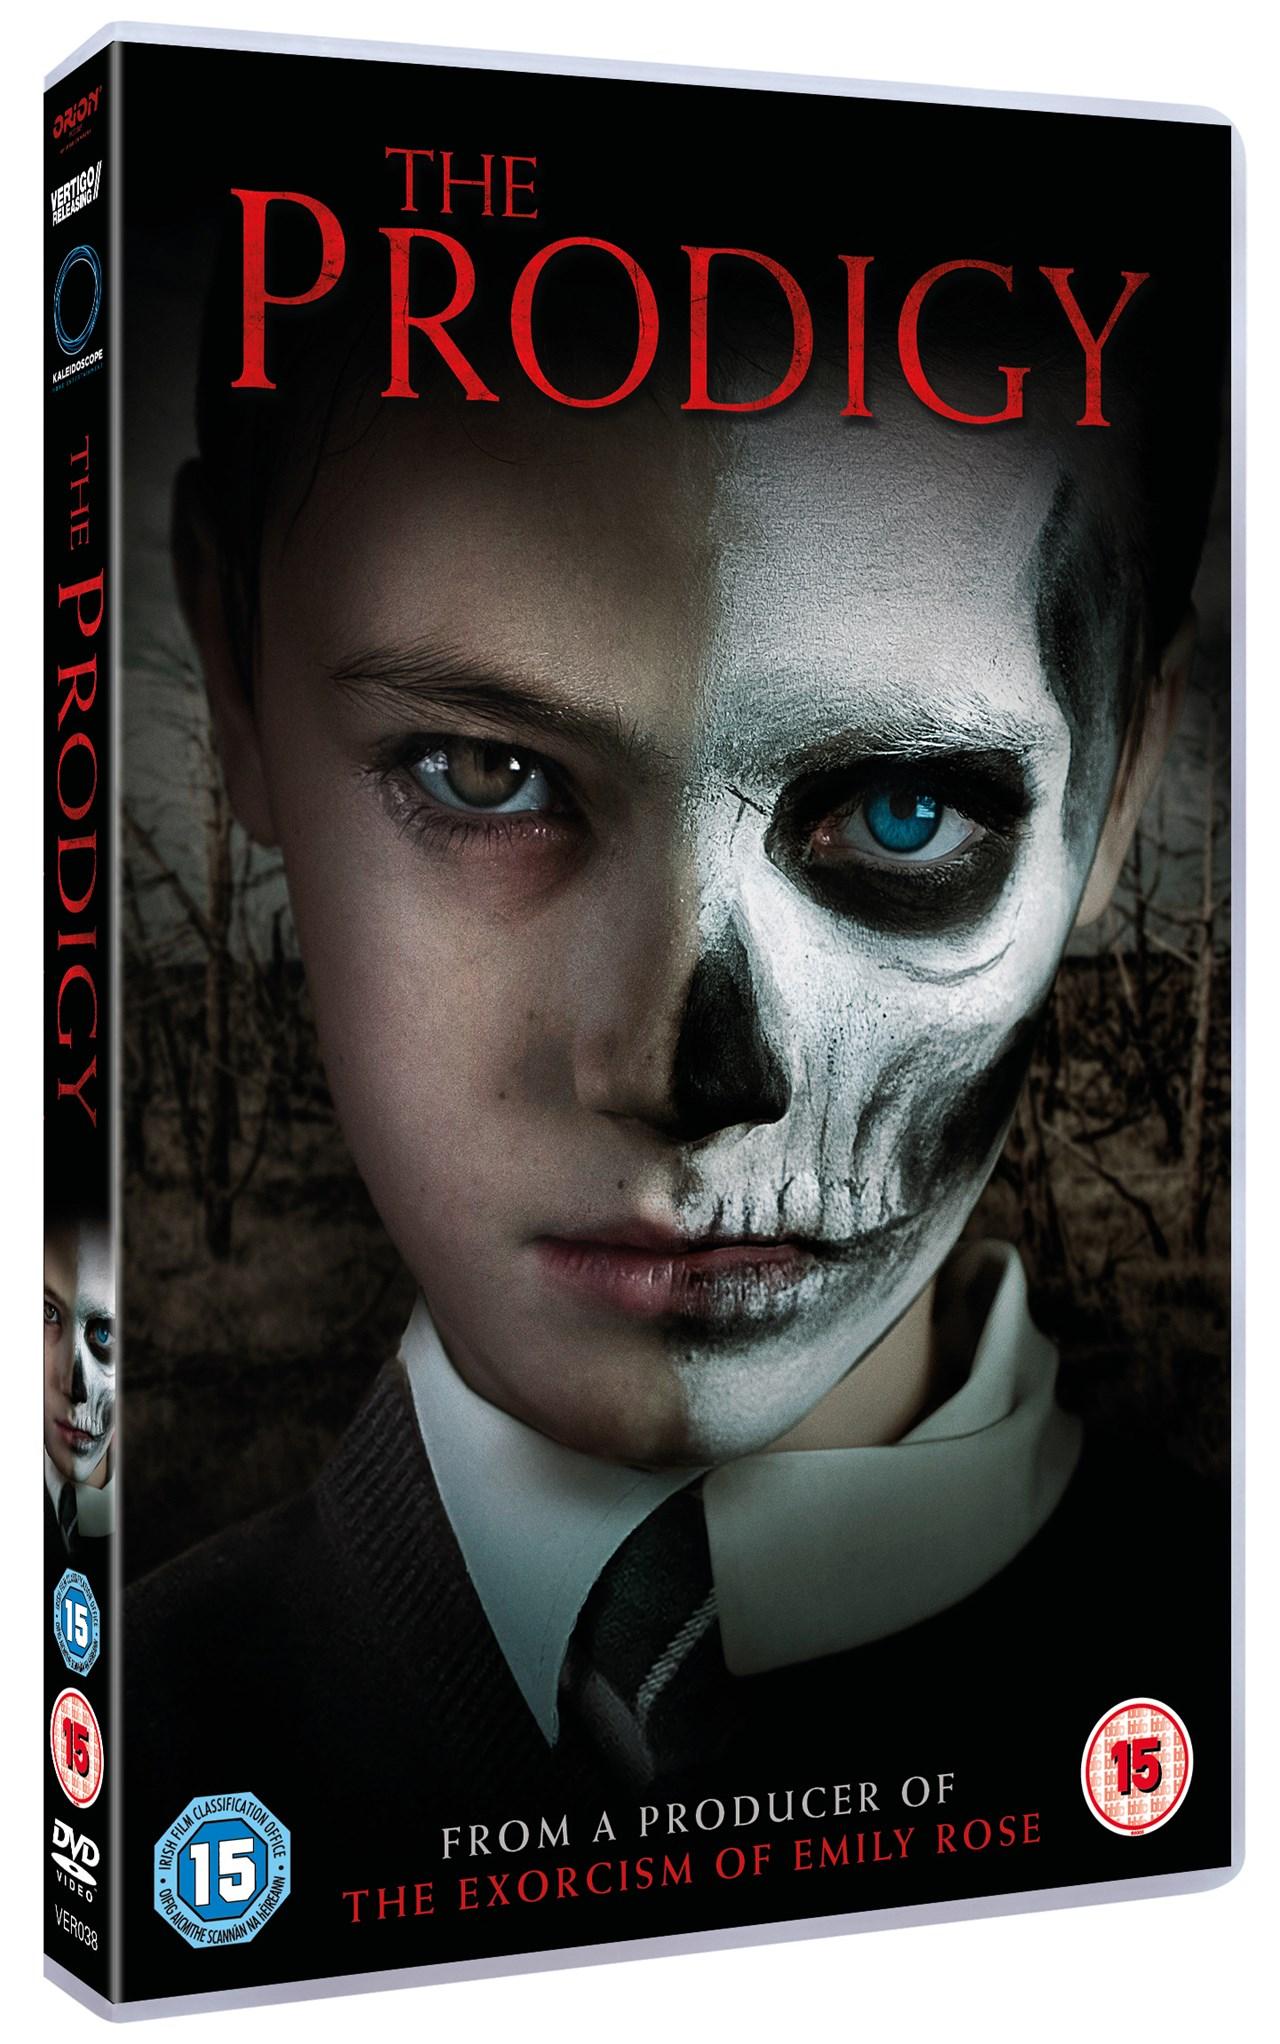 The Prodigy - 2